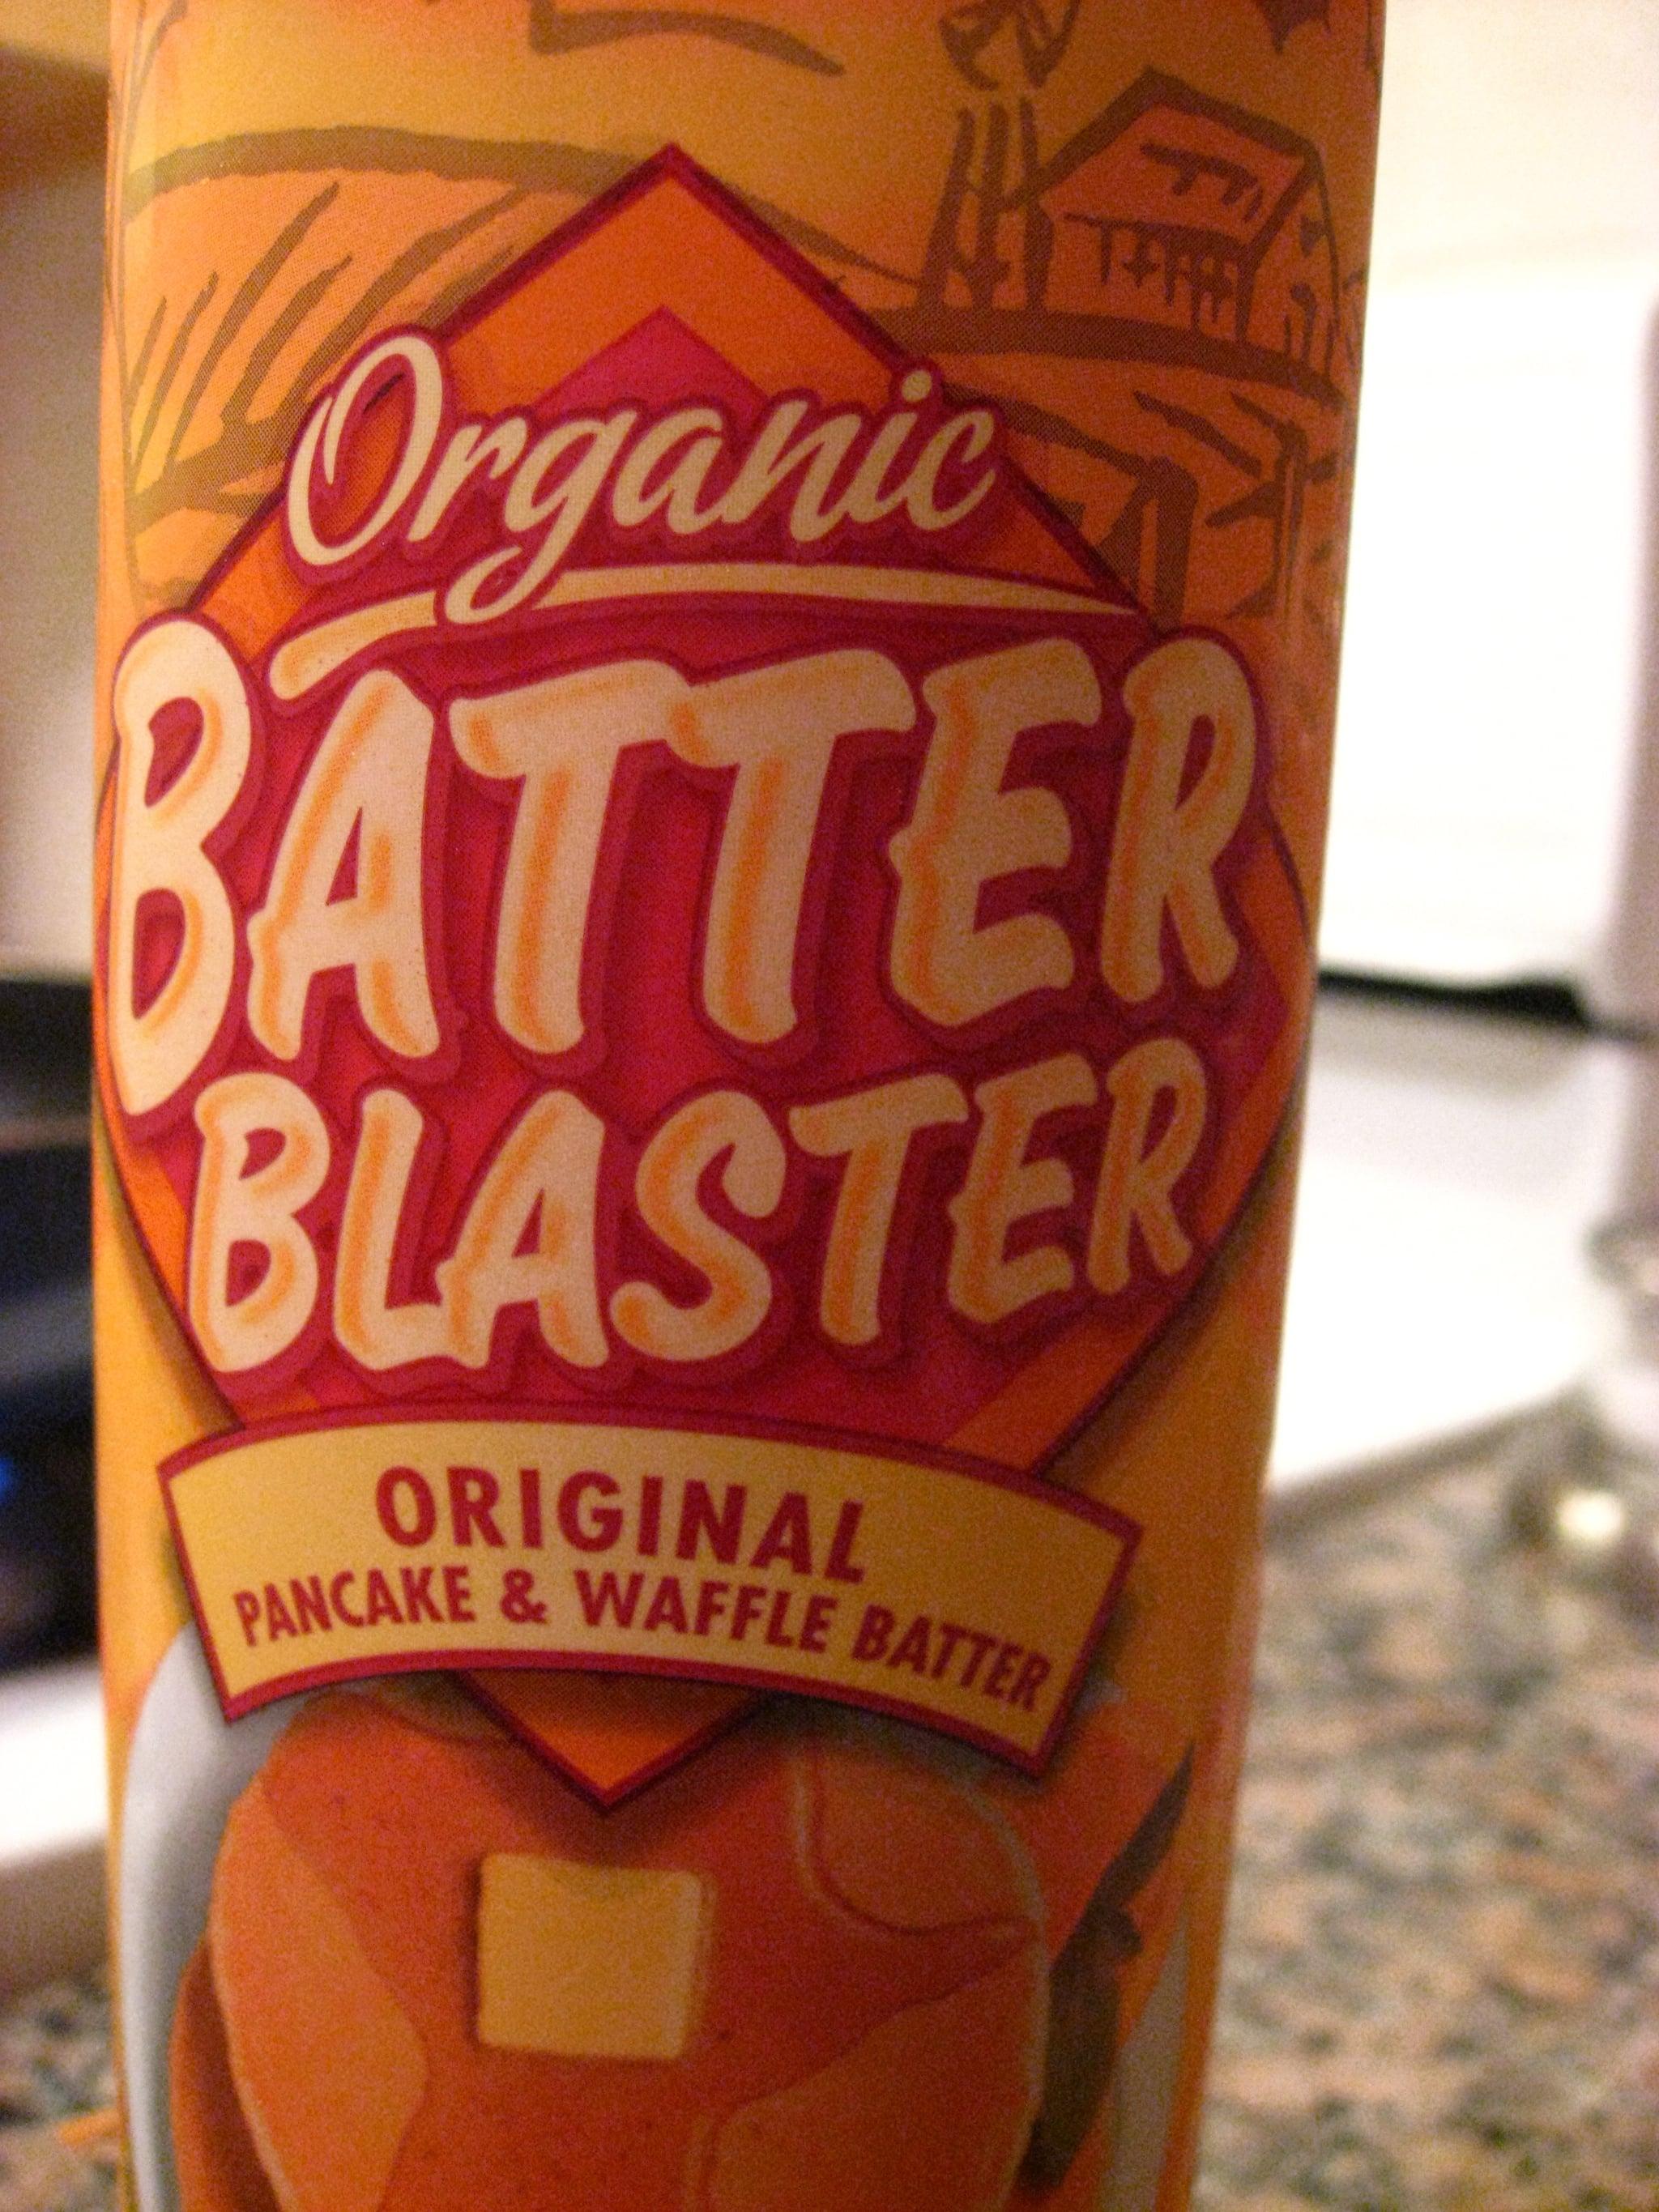 Batter Blaster Blasts Away My Expectations